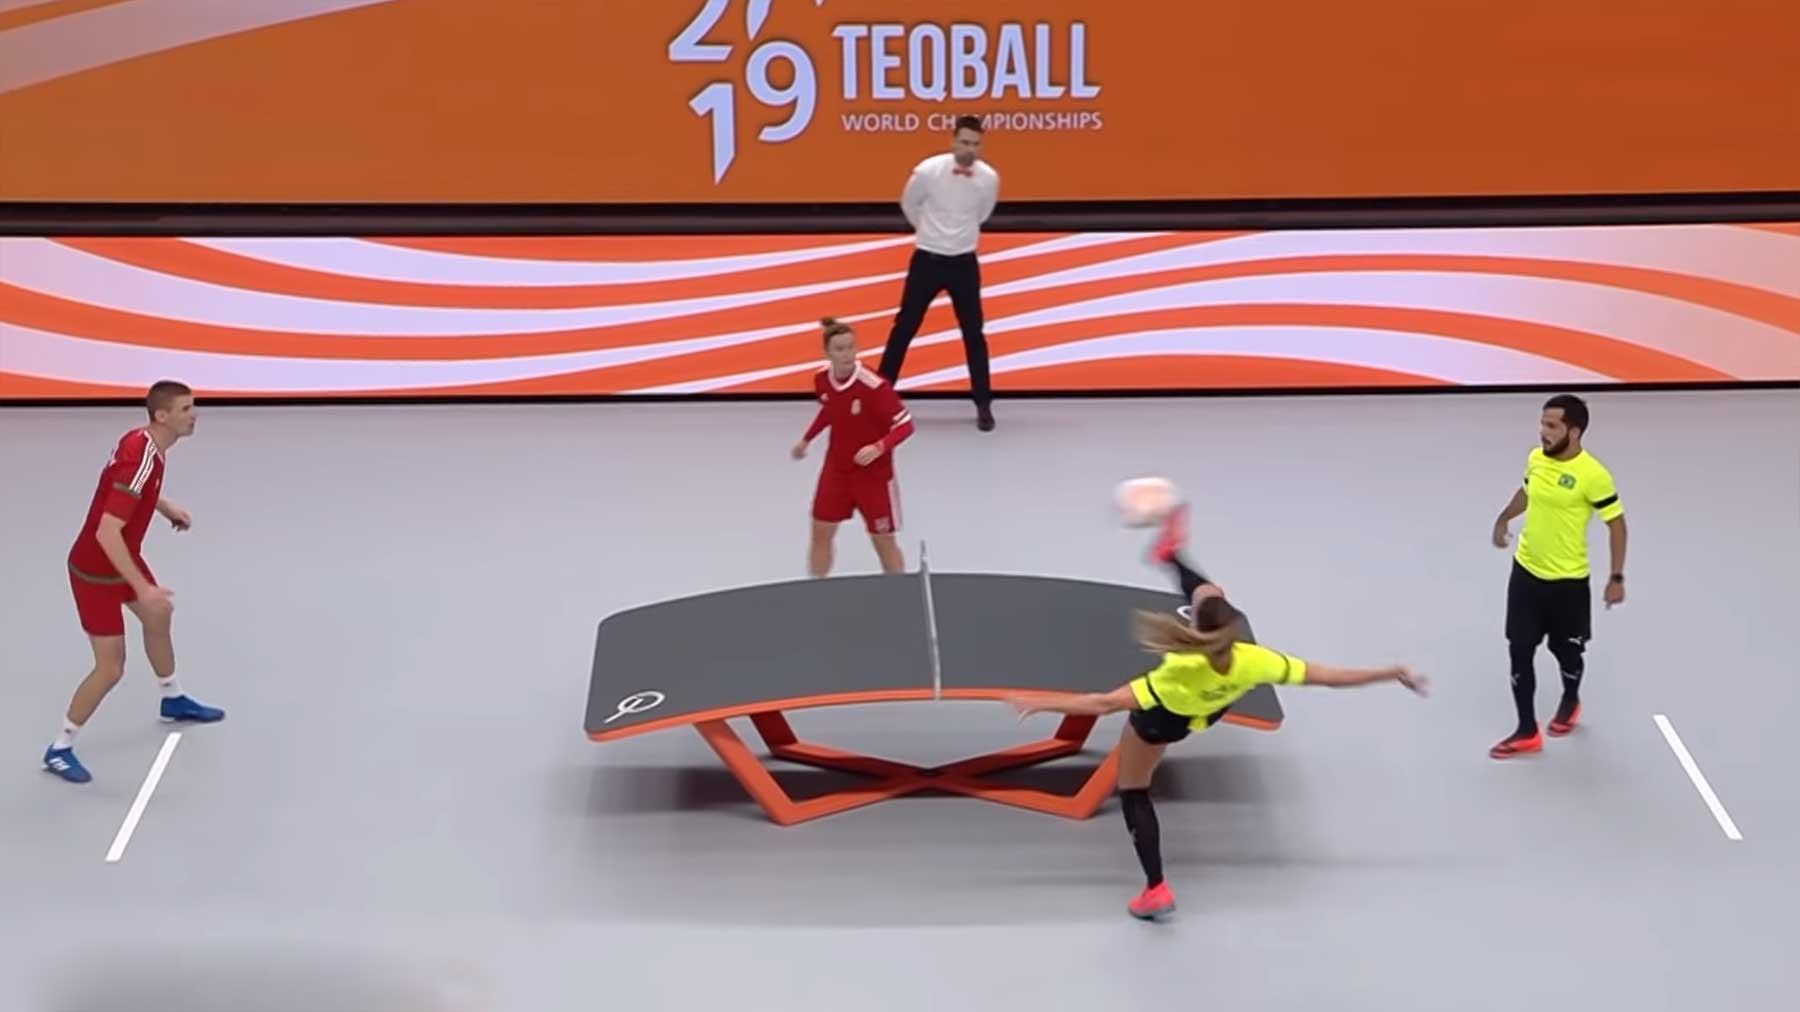 Fußball-Tischtennis: Teqball Weltmeisterschaften 2019